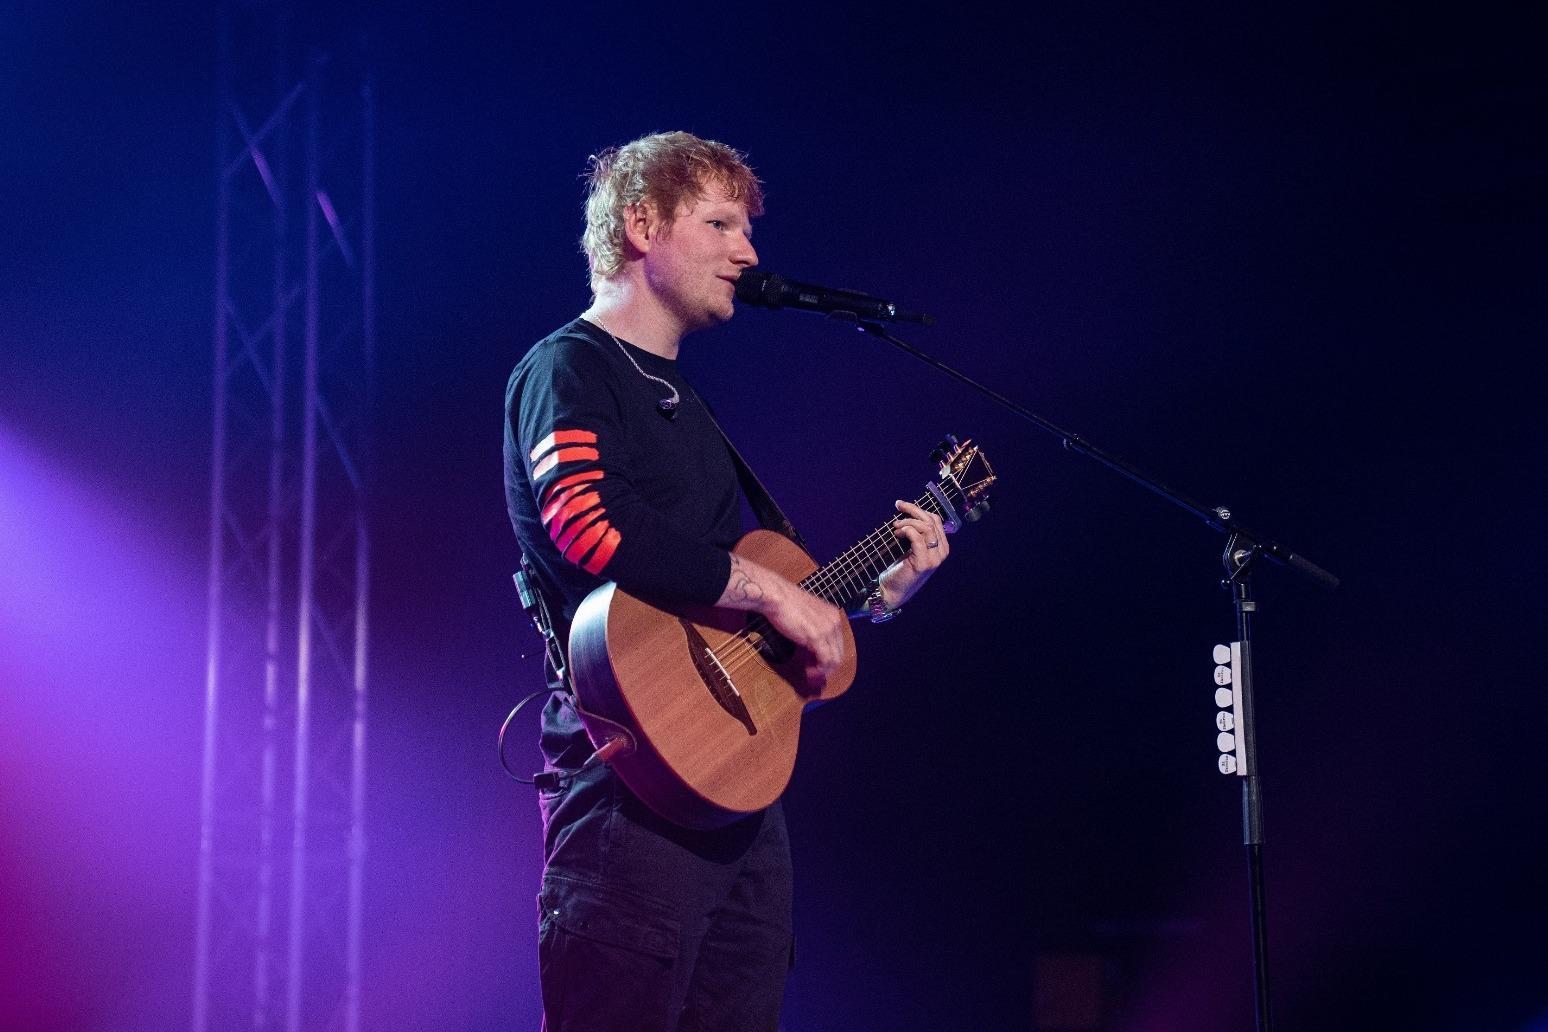 Ed Sheeran closes Paris leg of star-studded Global Citizen Live event